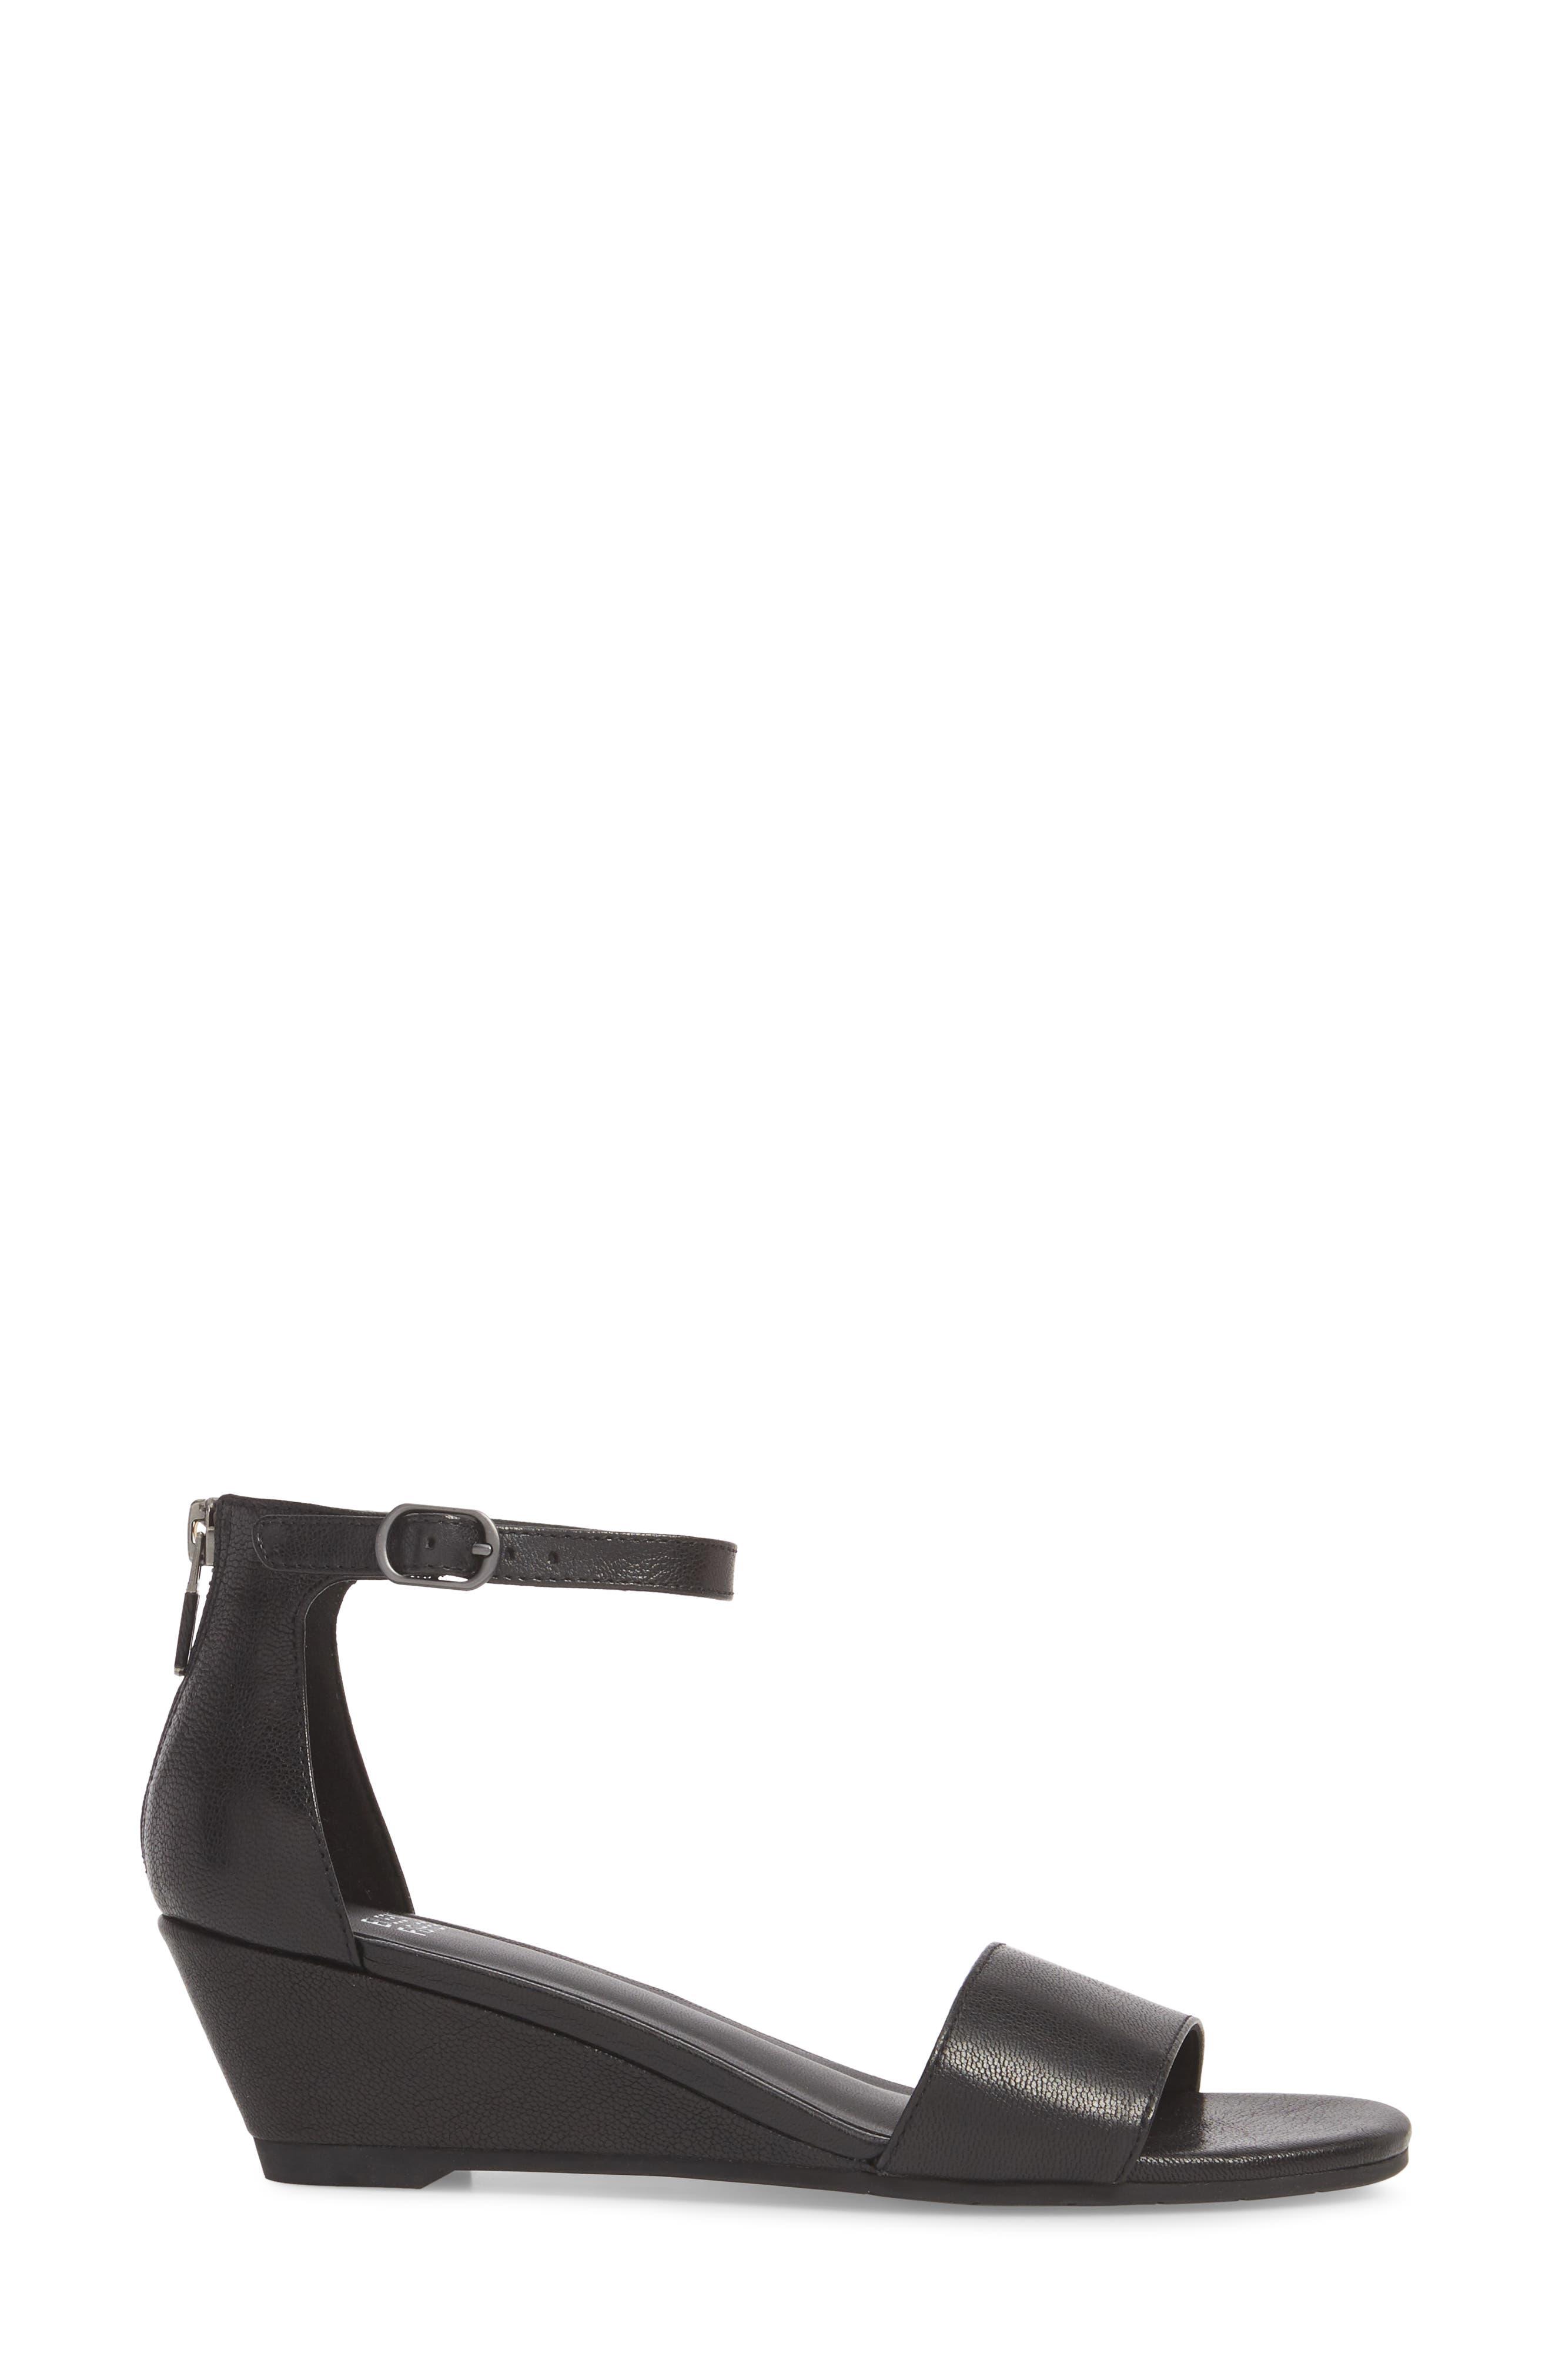 Mara Ankle Strap Wedge Sandal,                             Alternate thumbnail 3, color,                             Black Leather